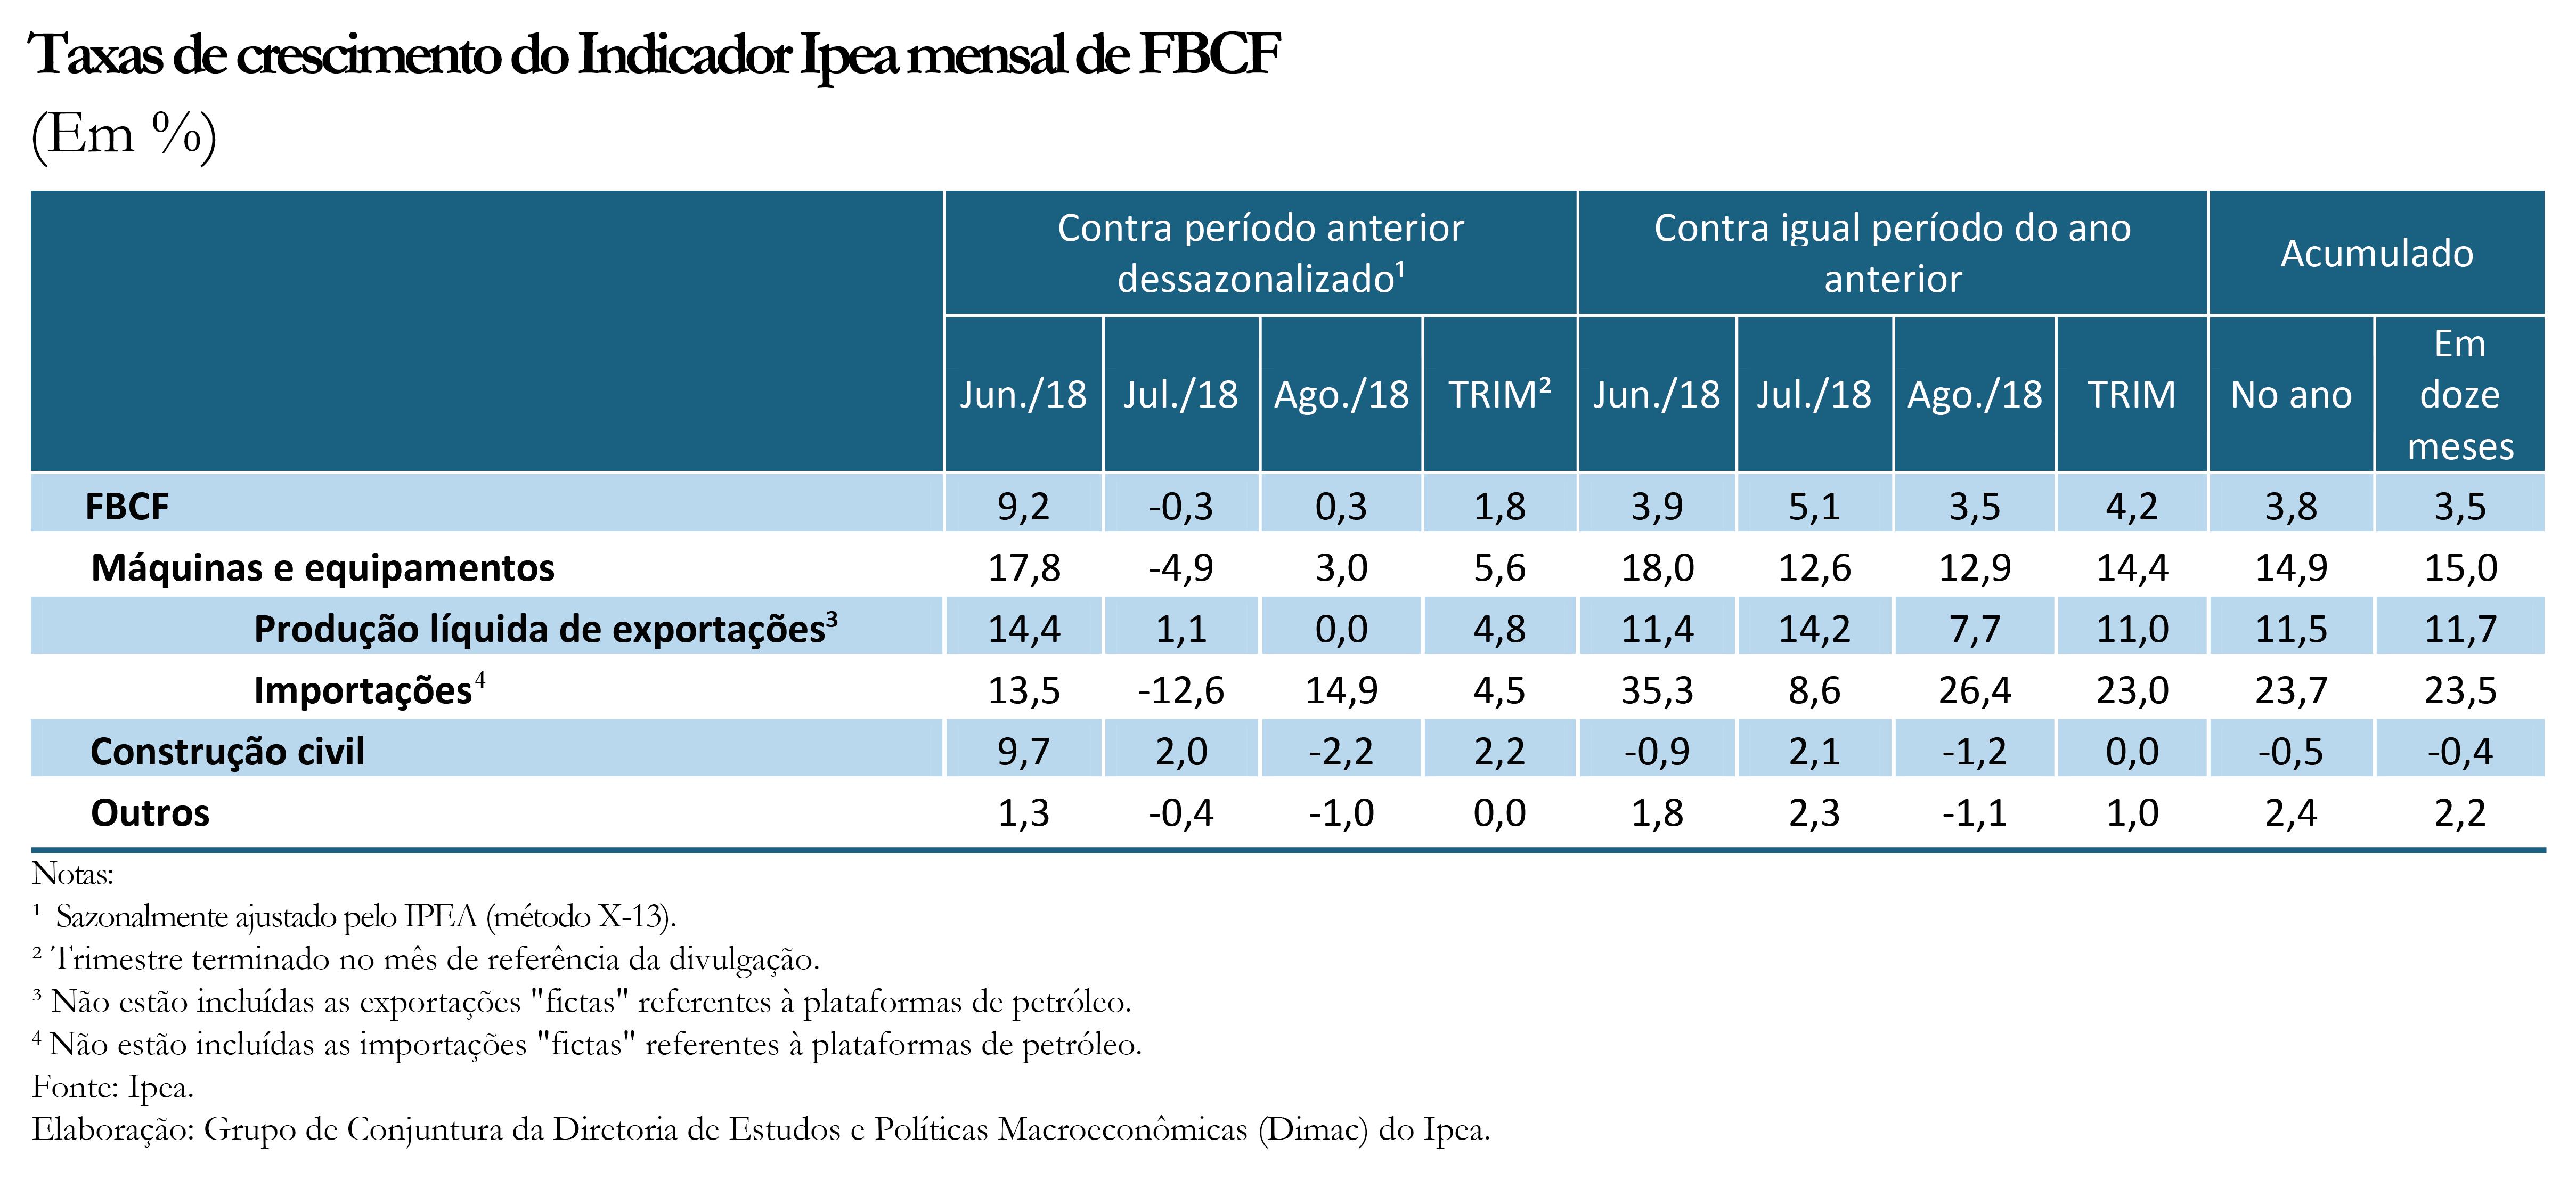 Tabela - Indicador Ipea FBCF ago18